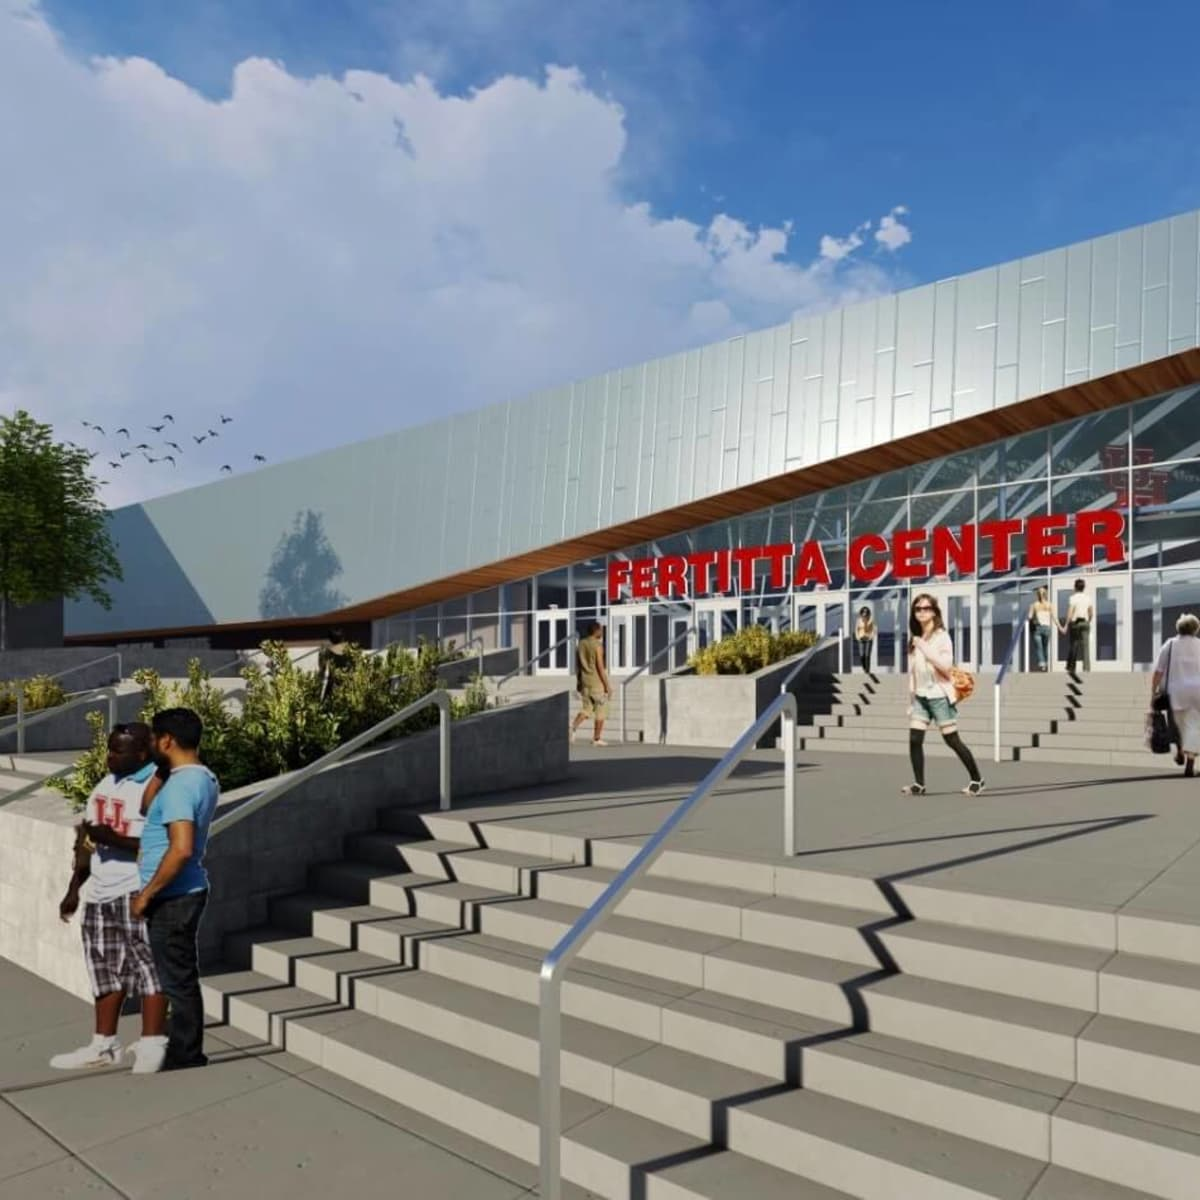 Fertitta Center exterior rendering